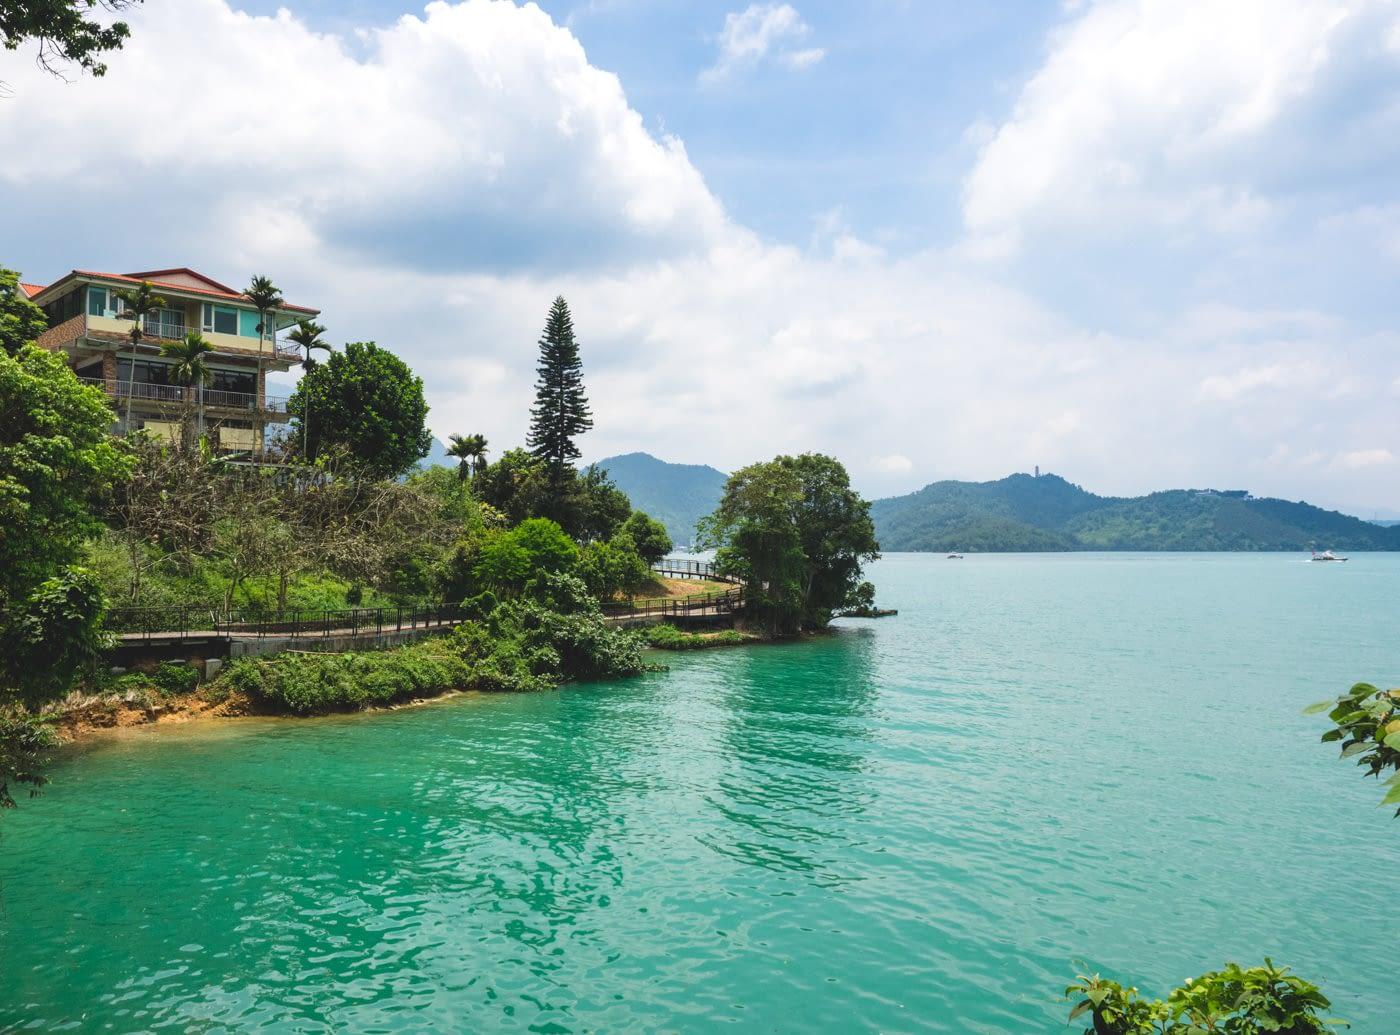 Taiwan - Sun Moon Lake - Green lake and a house